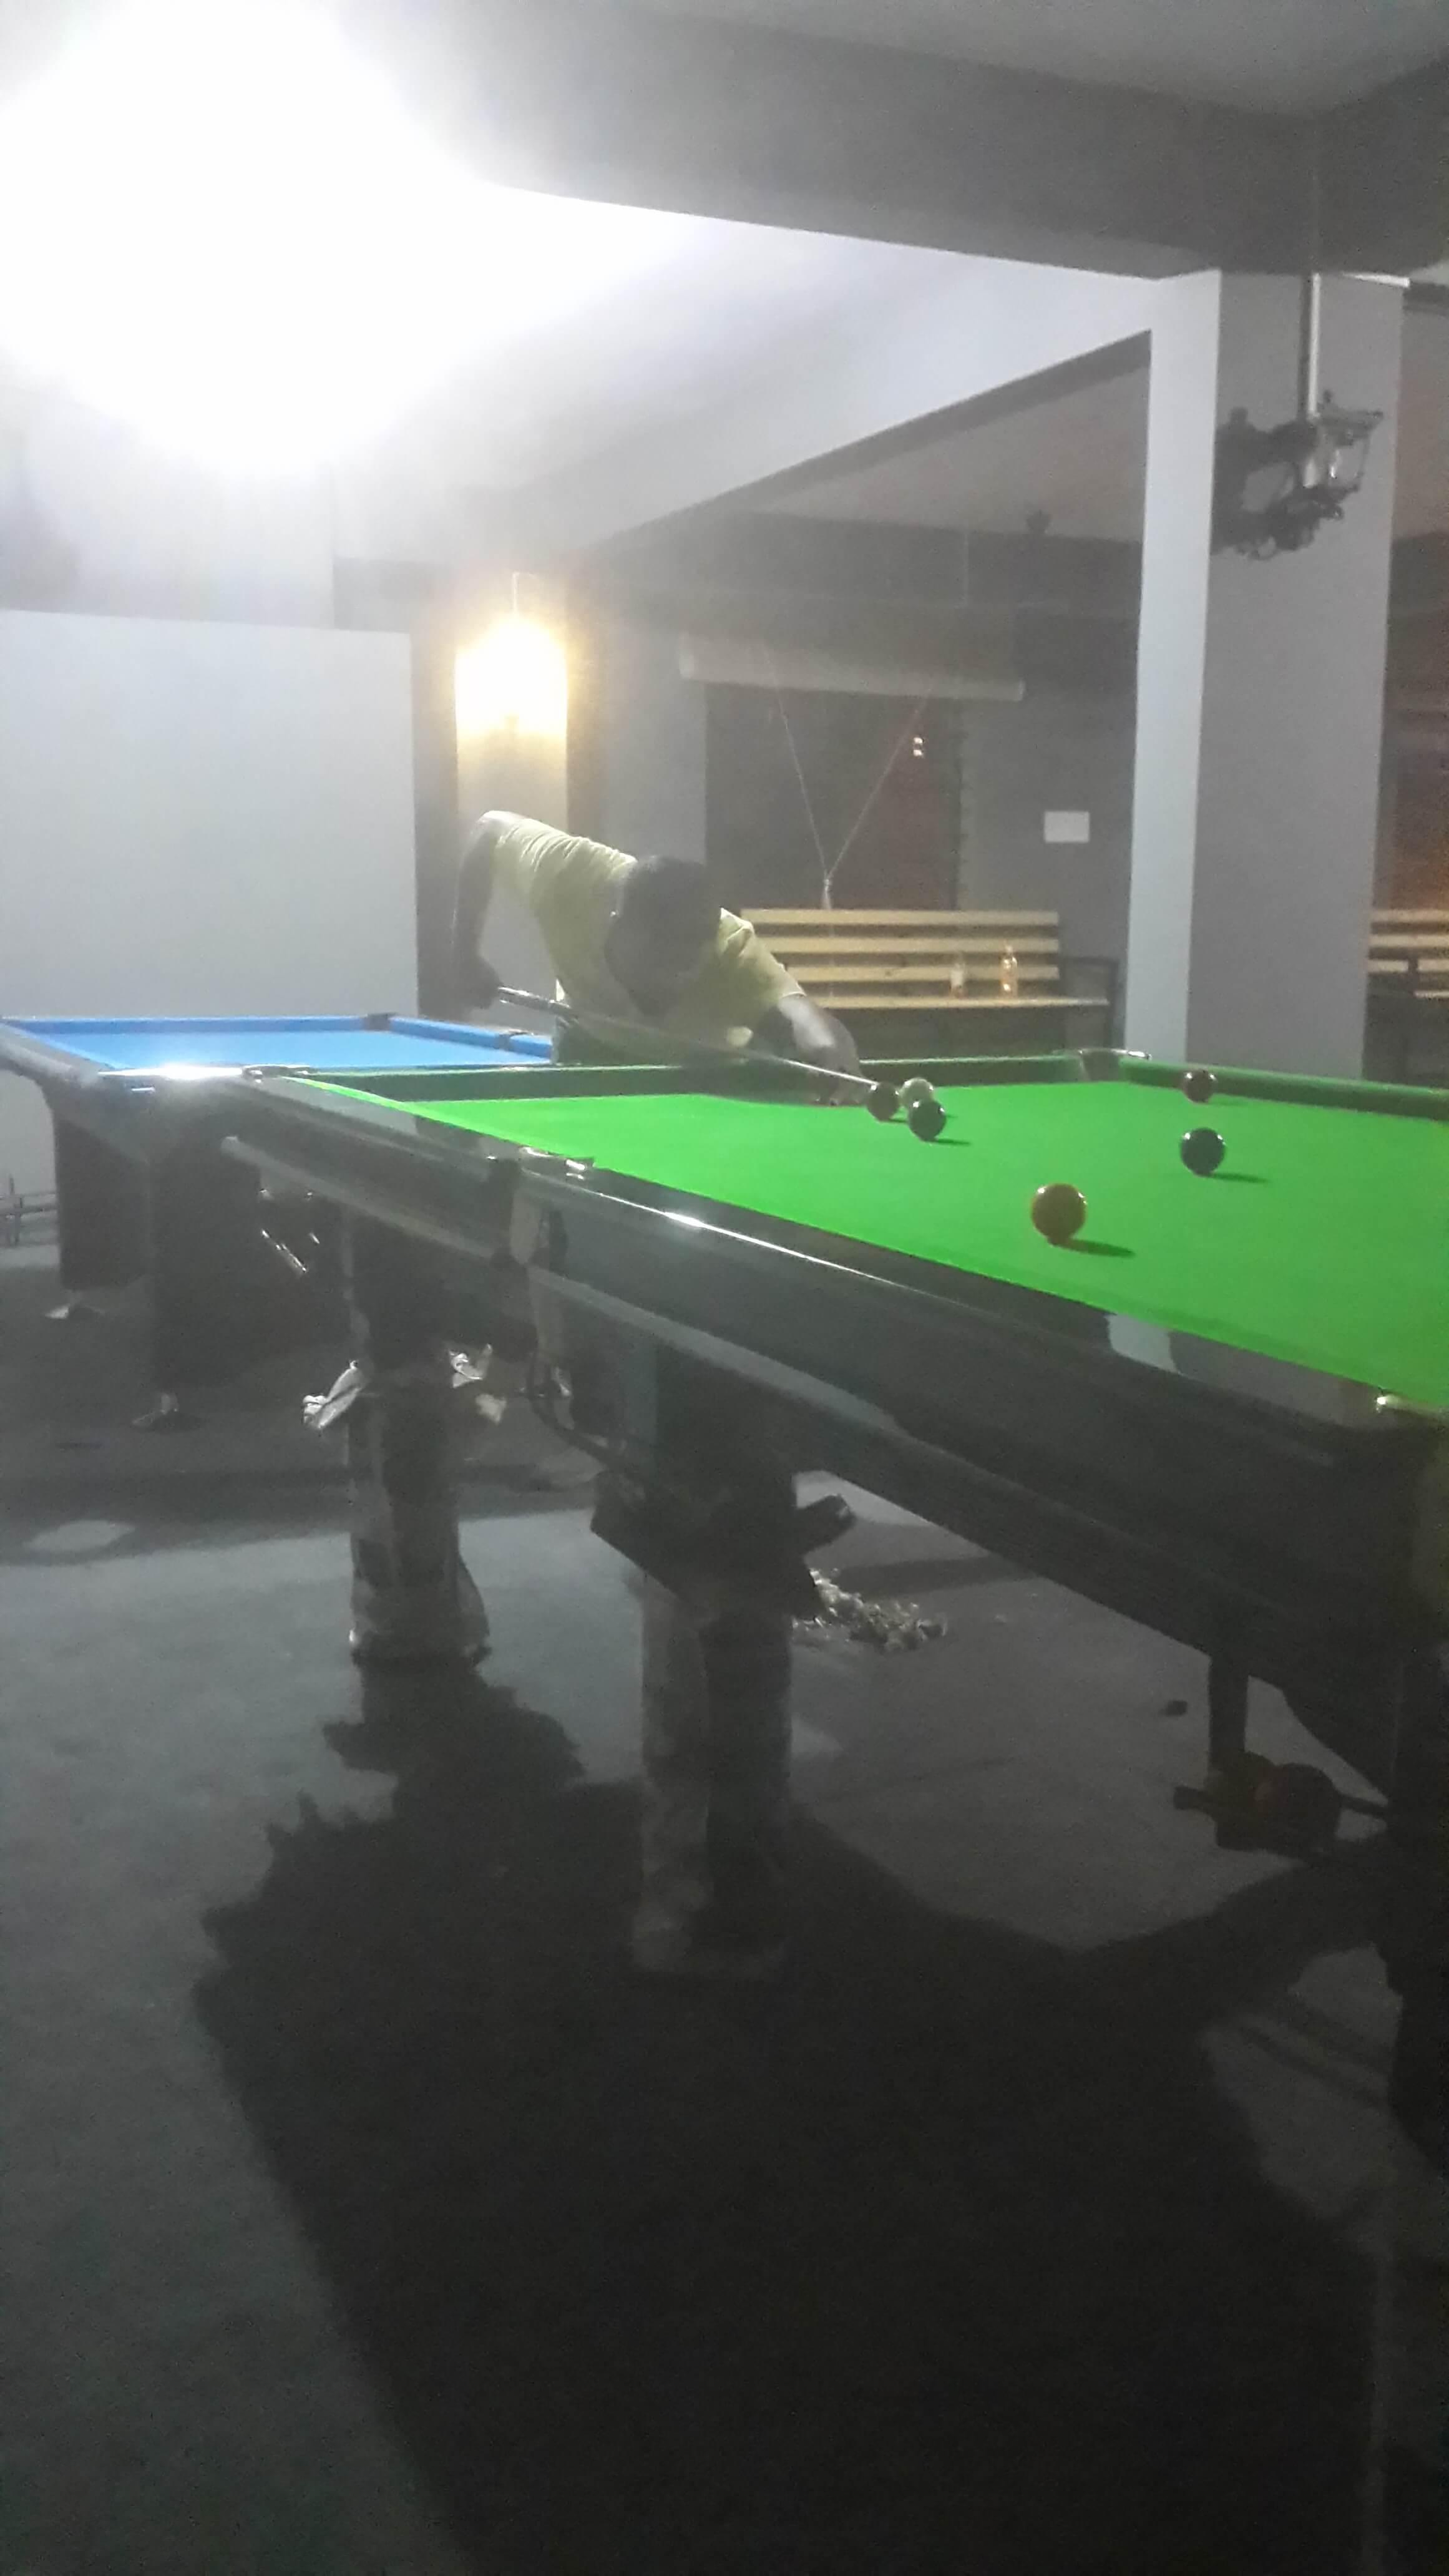 HandysSnookerandPoolClub0